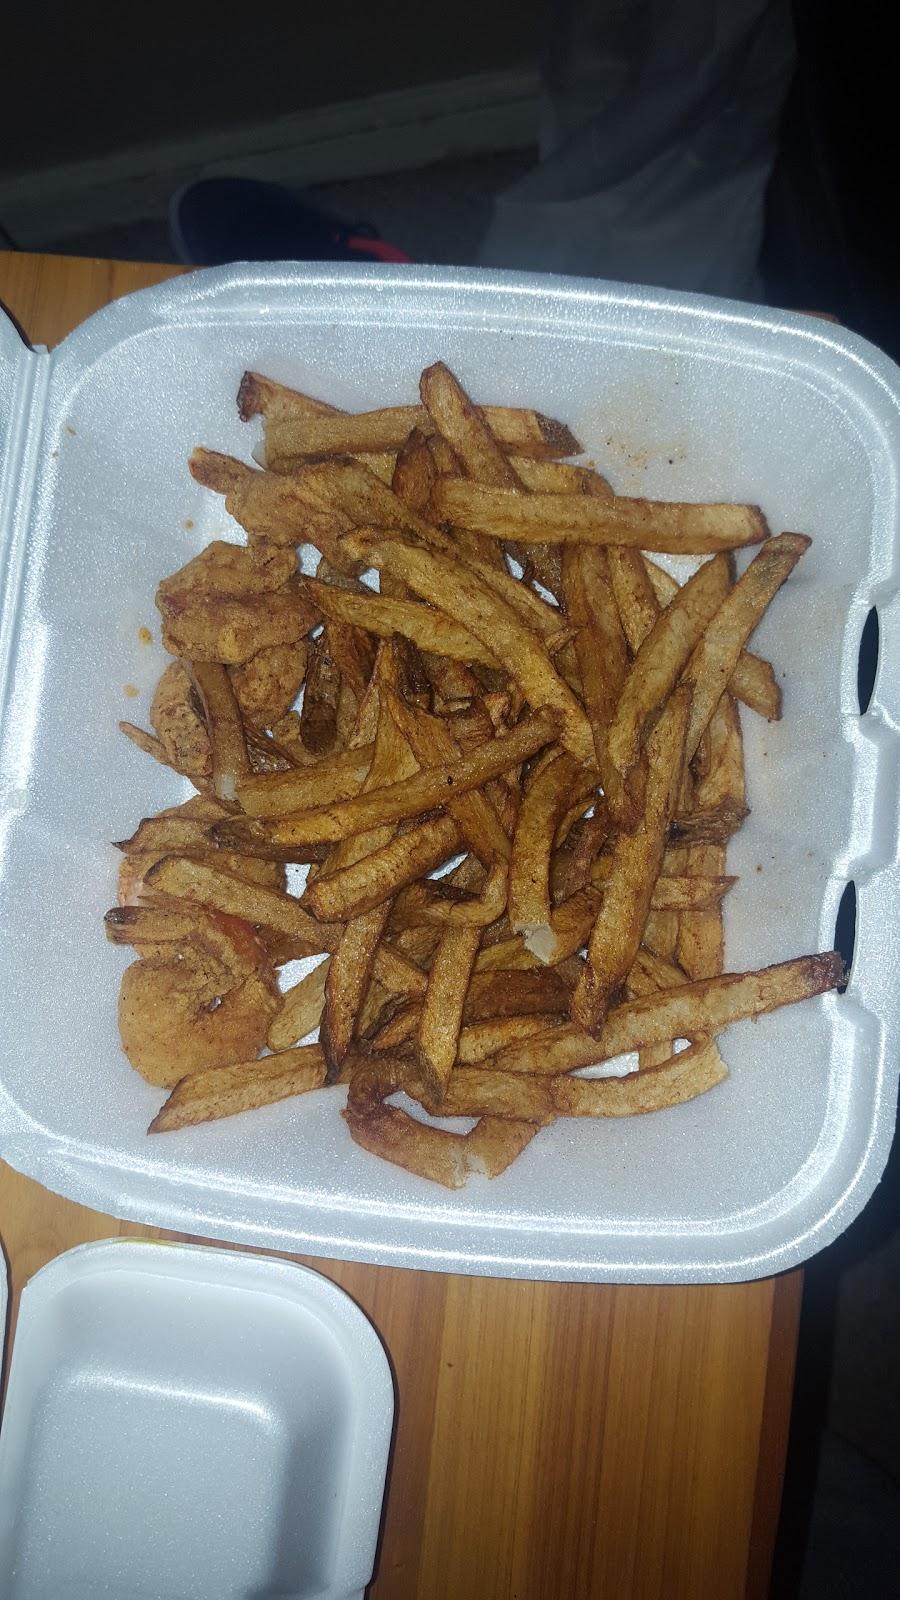 Motor City Burgzs - restaurant    Photo 5 of 10   Address: 17627 E Warren Ave, Detroit, MI 48224, USA   Phone: (313) 640-3956